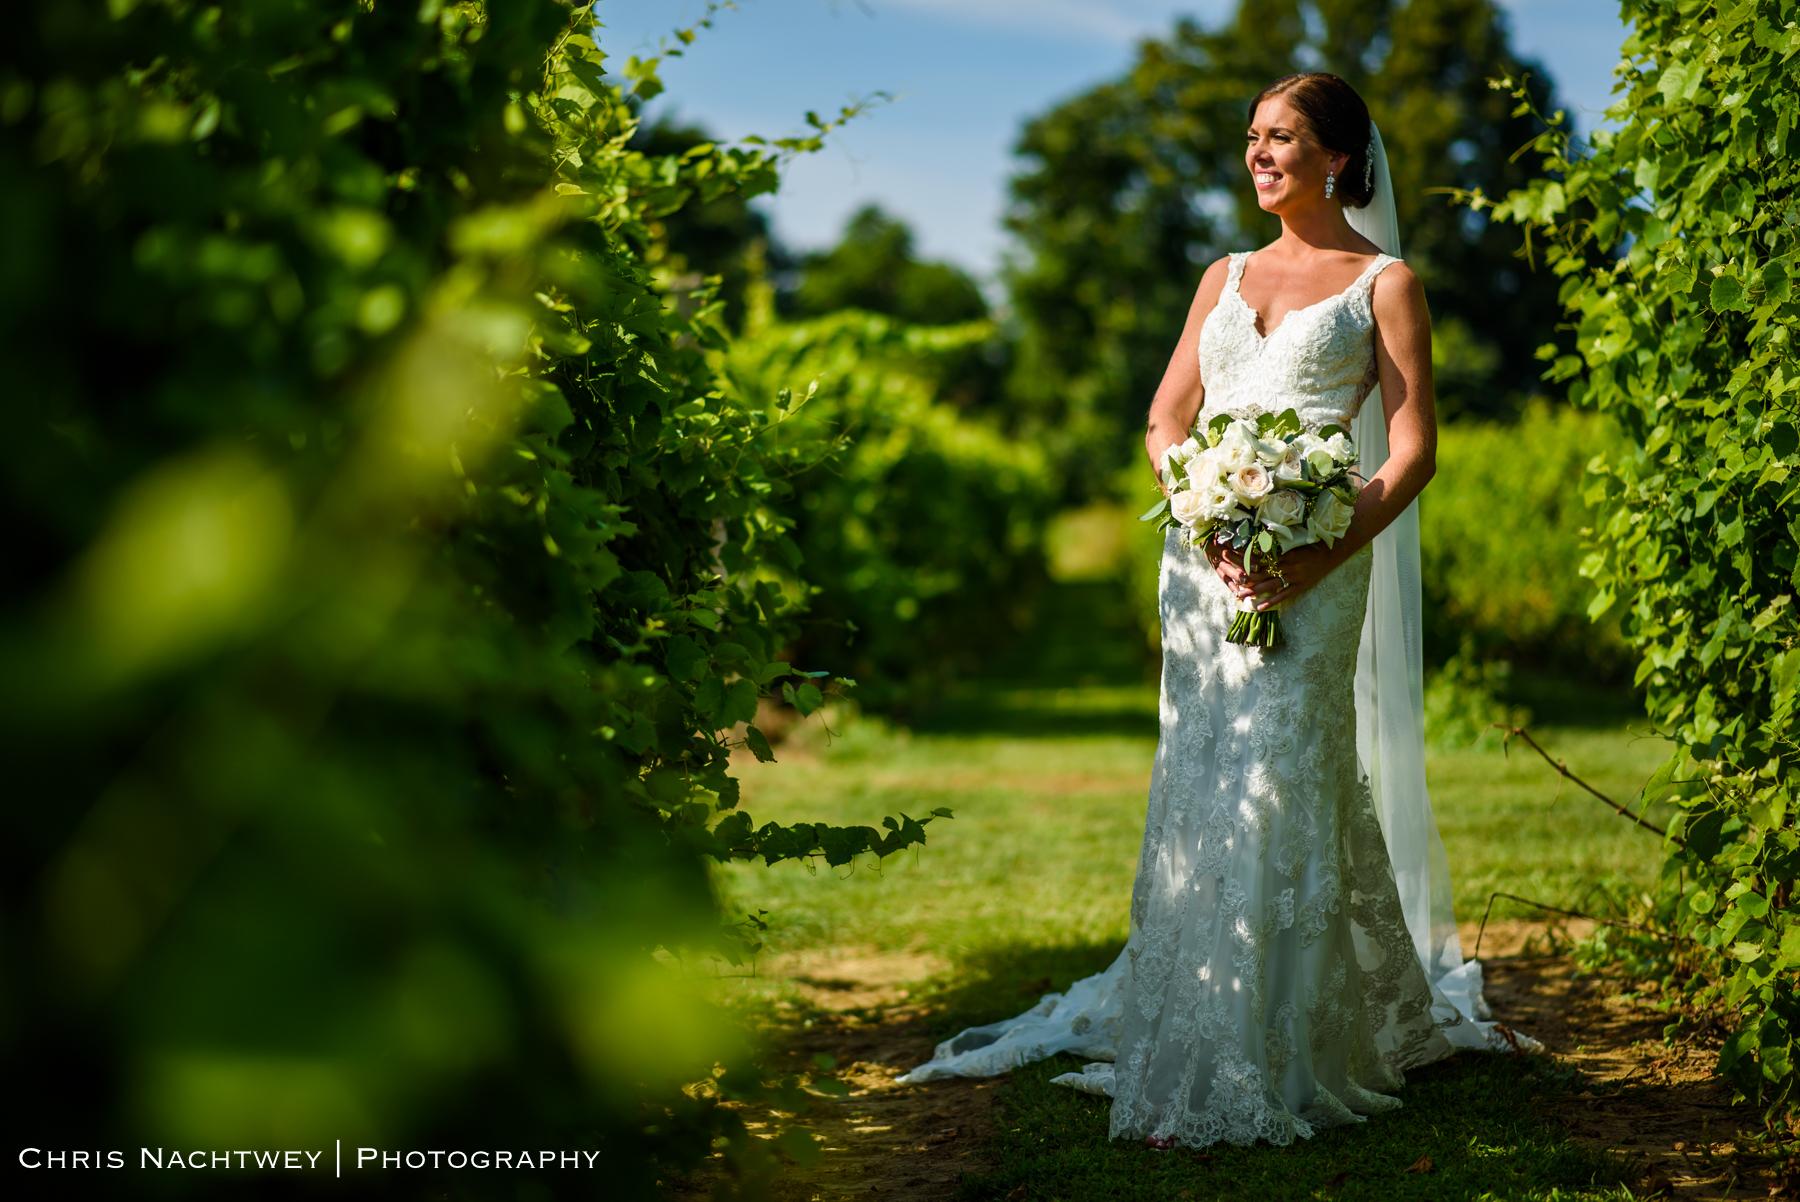 wedding-lake-of-isles-photos-chris-nachtwey-photography-2019-18.jpg